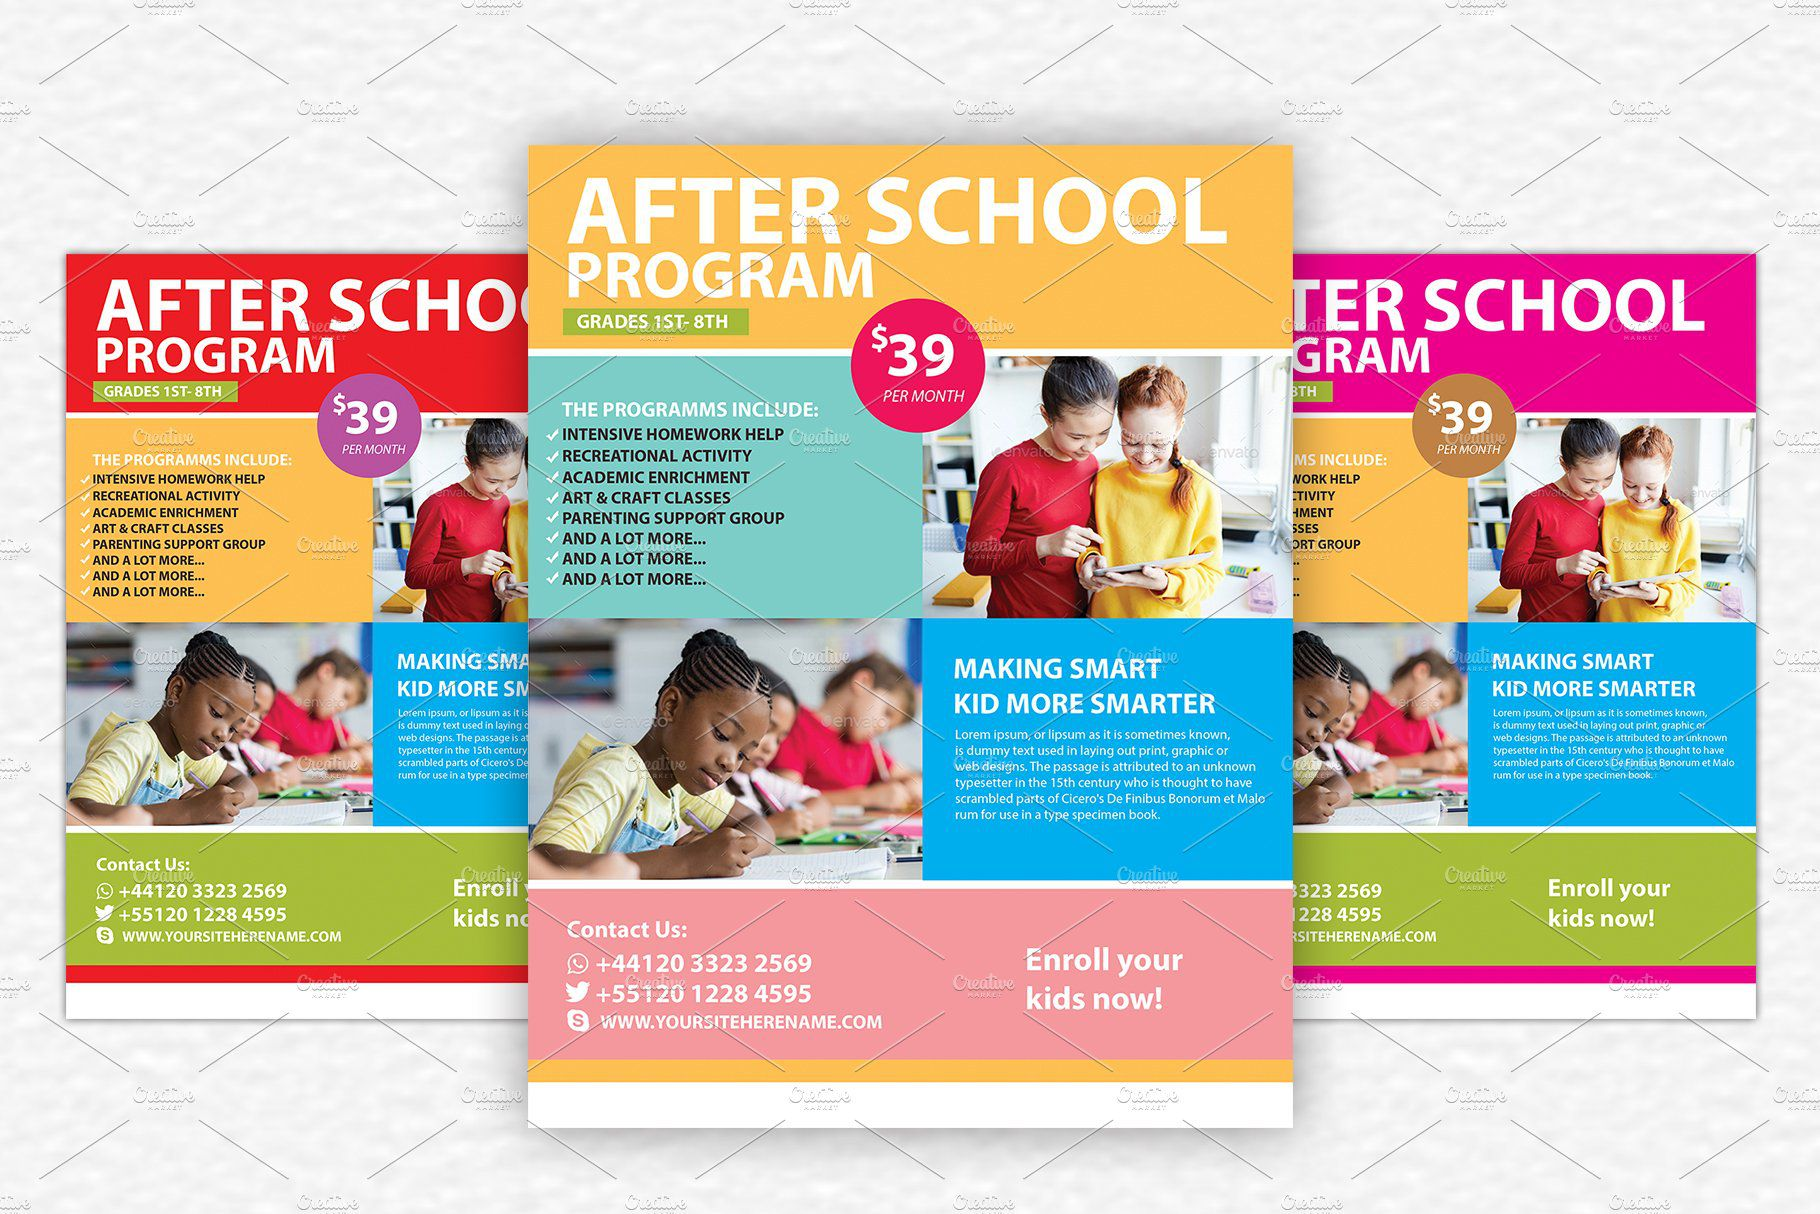 009 Impressive Free After School Program Flyer Template Example Full